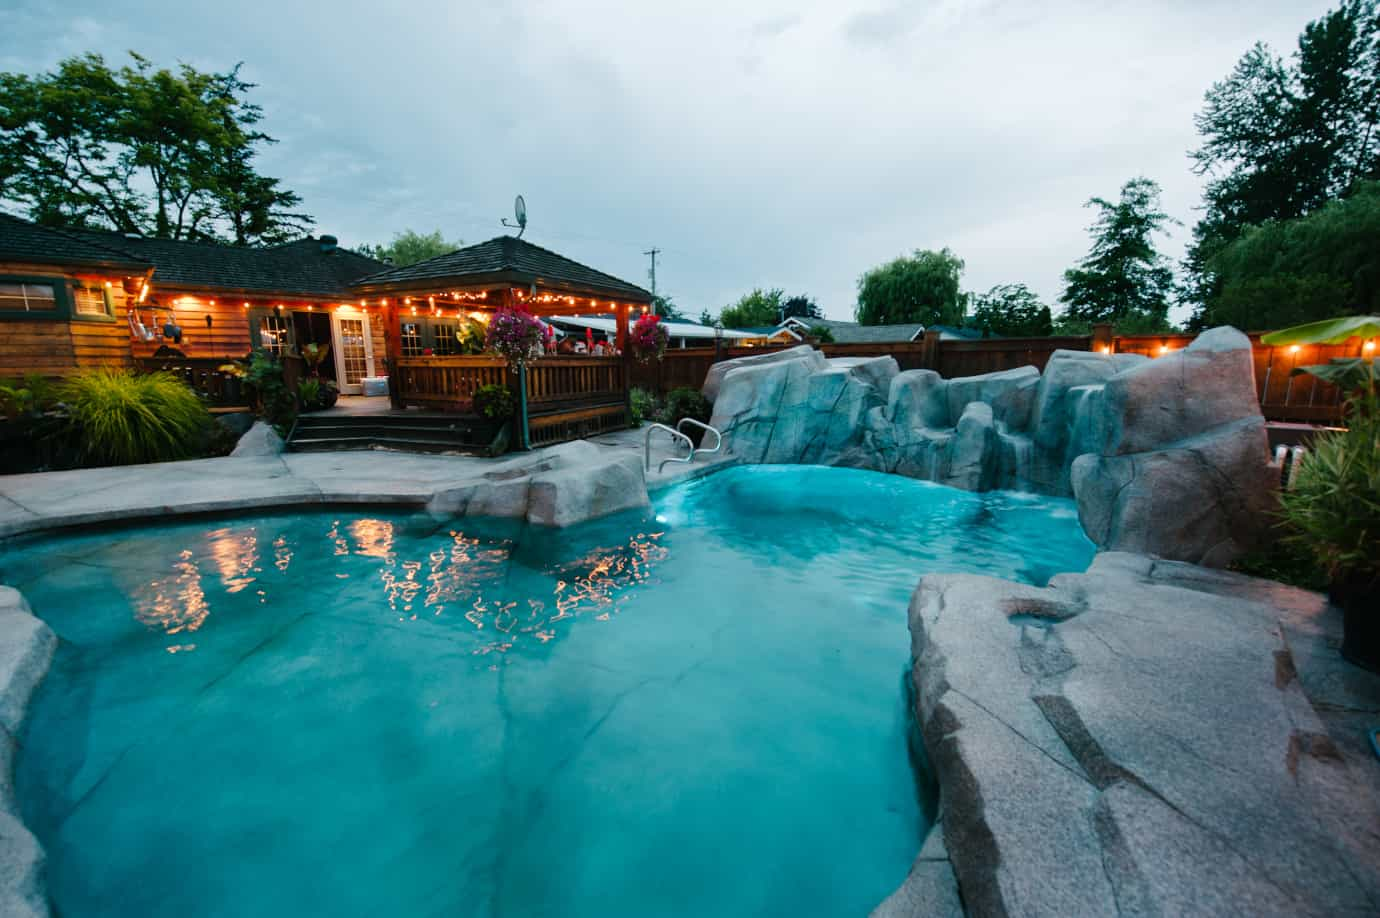 azuro-custom-swimming-pool-Cla51